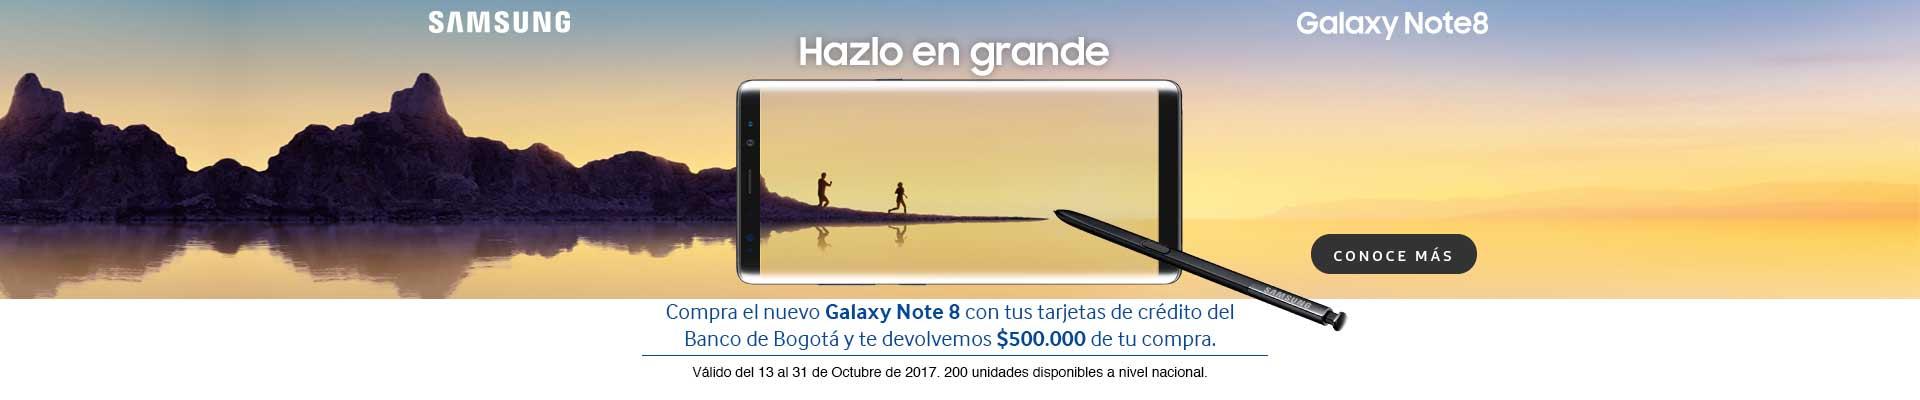 PPAL-AK-3-celulares-LANZAMIENTO-Celular-Libre-SAMSUNG-Galaxy-Note8-landing-octubre14-17